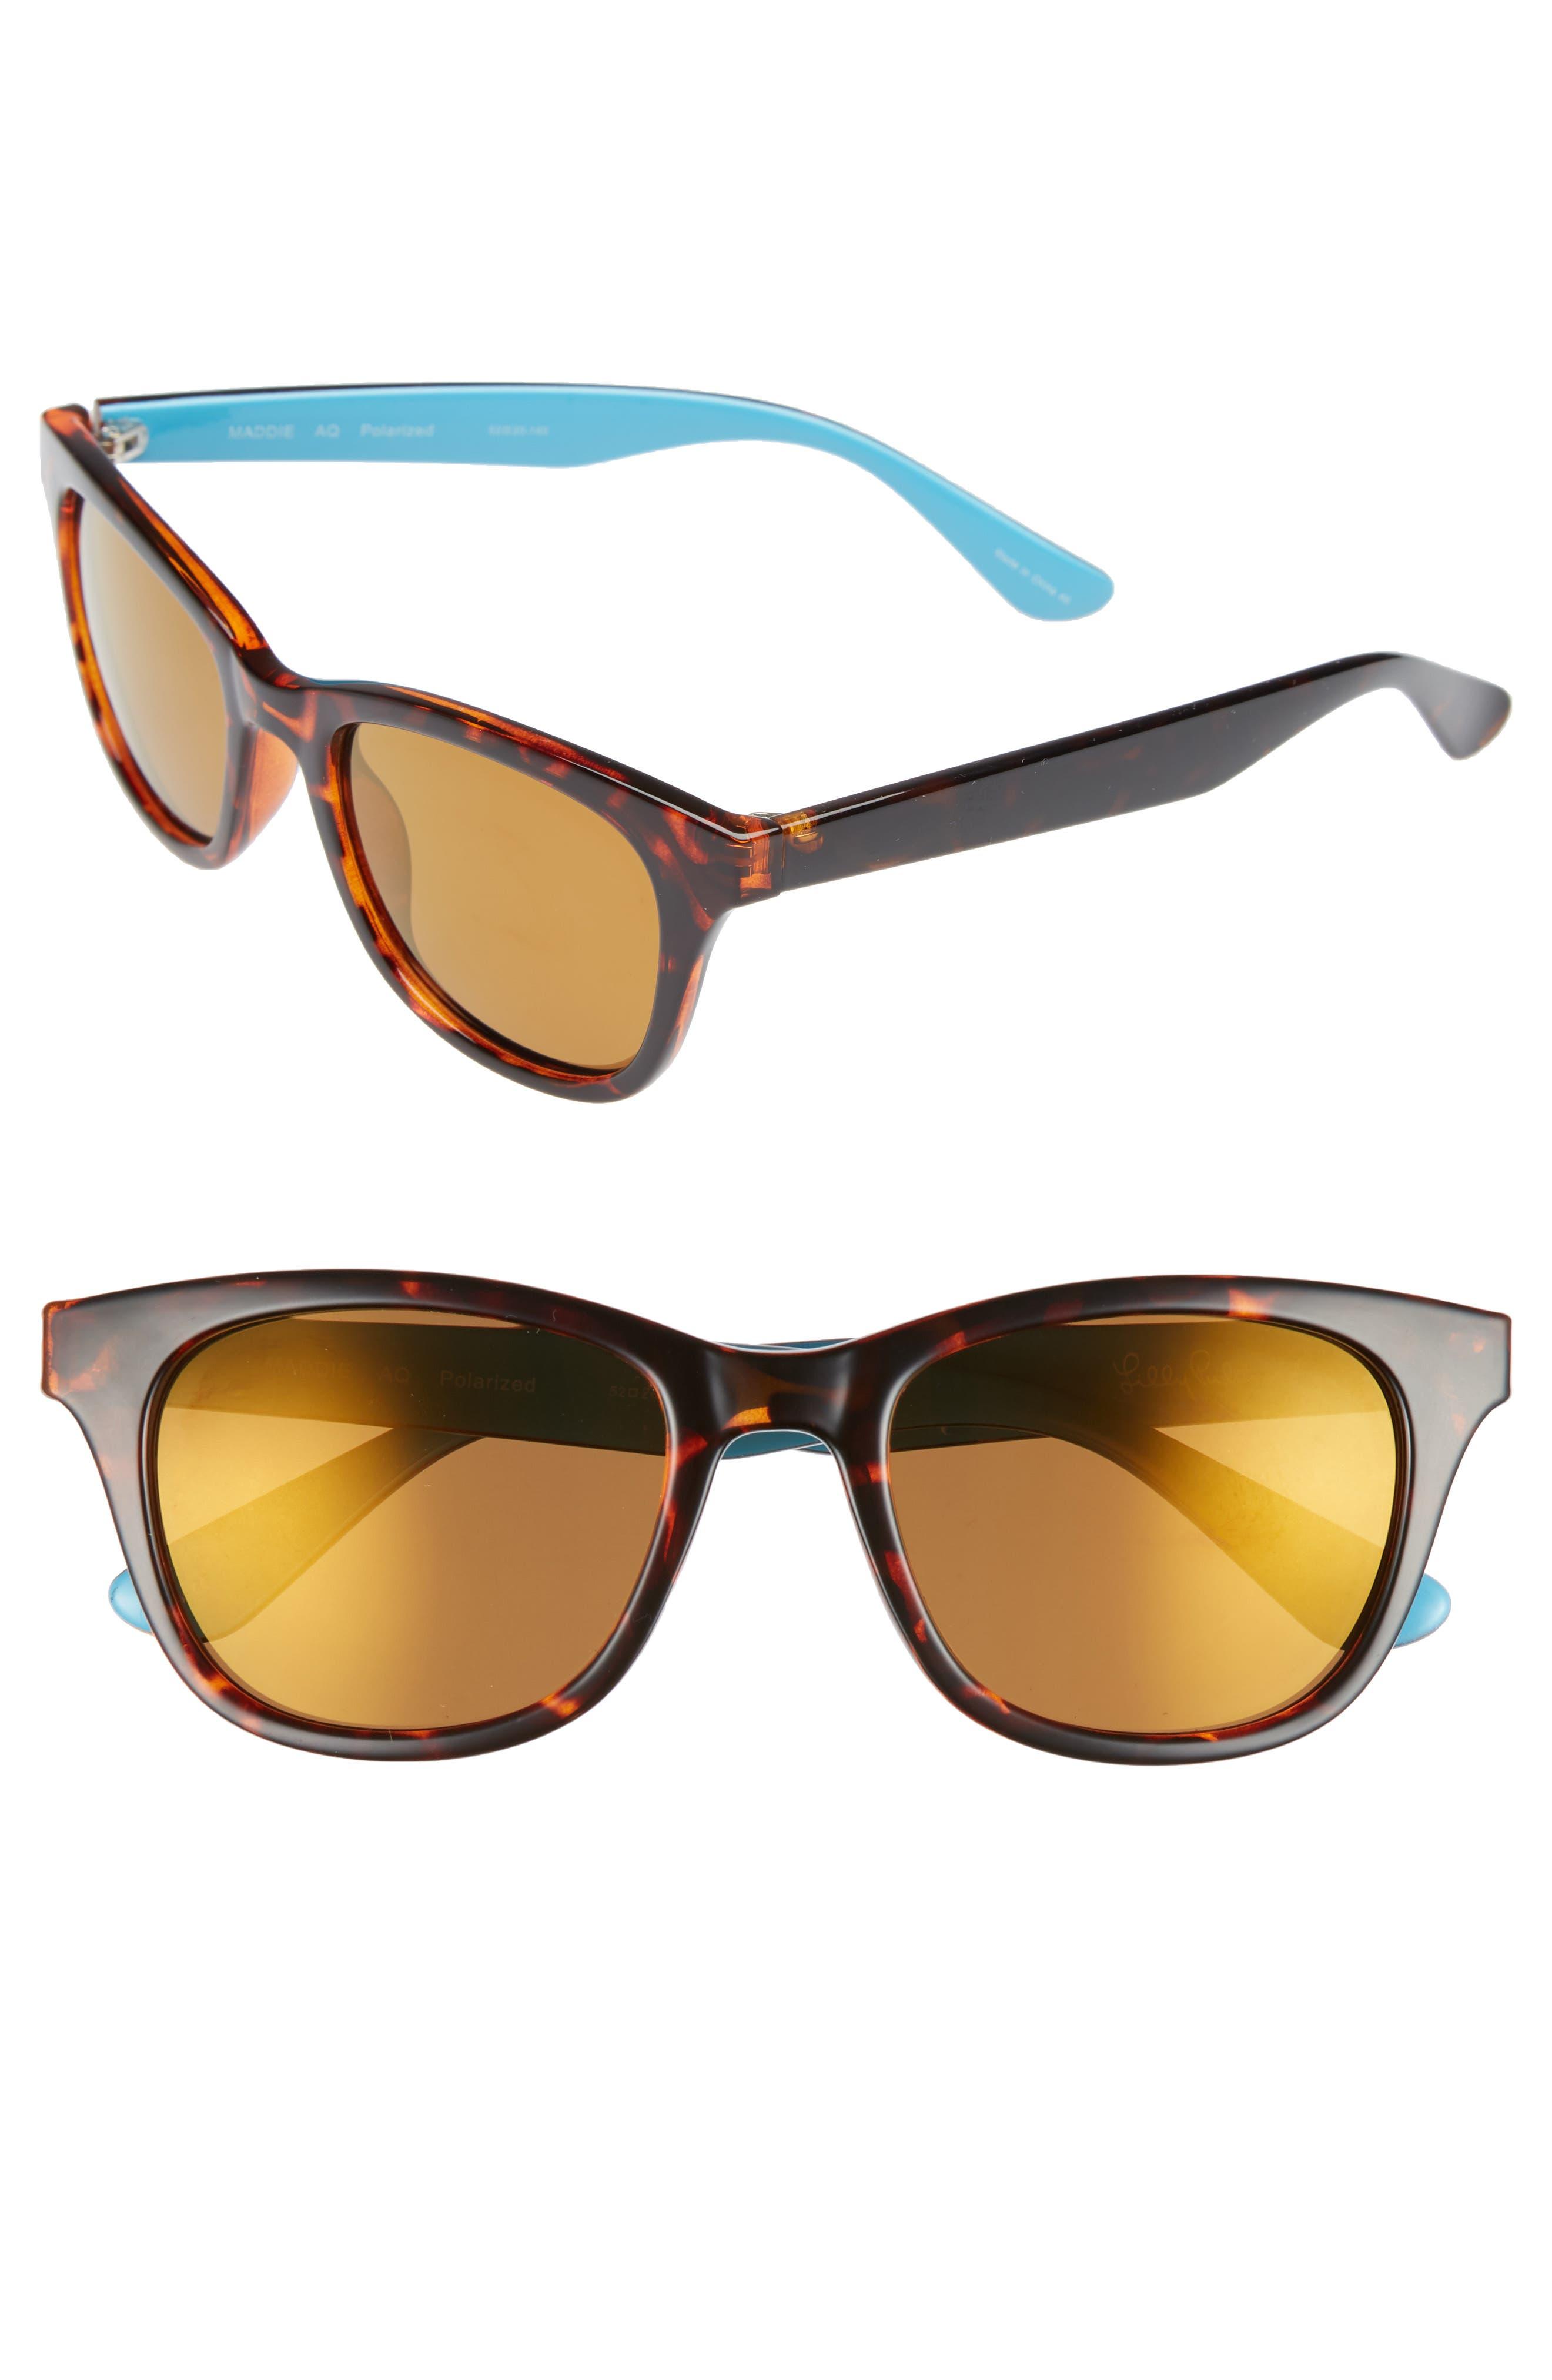 Maddie 52mm Polarized Mirrored Sunglasses,                         Main,                         color, AQUA/ GOLD FLASH